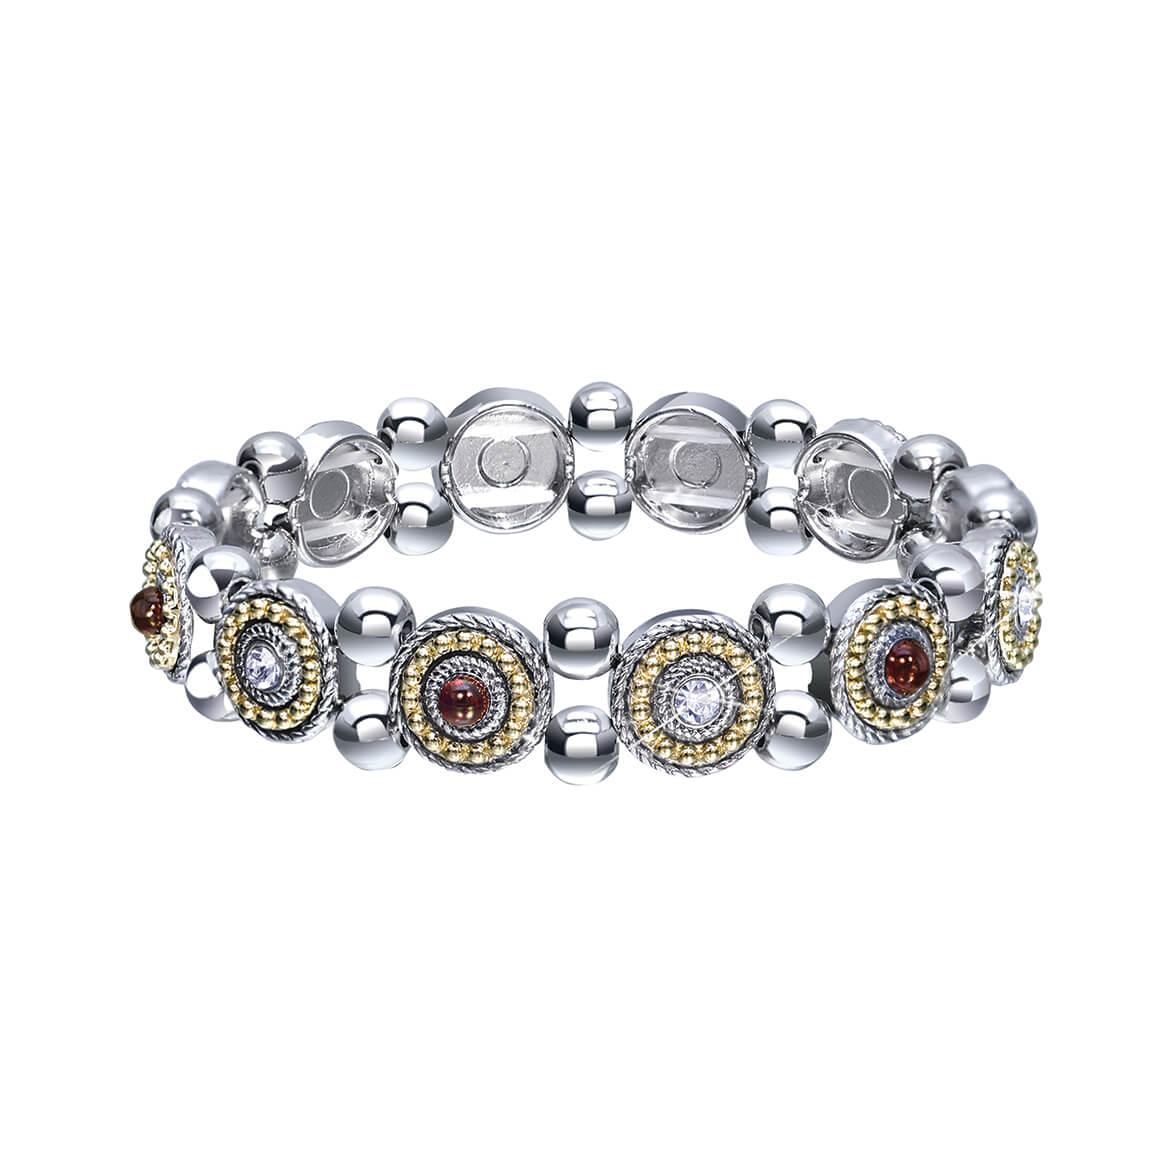 Geniune Garnet Stretch Bracelet-369854